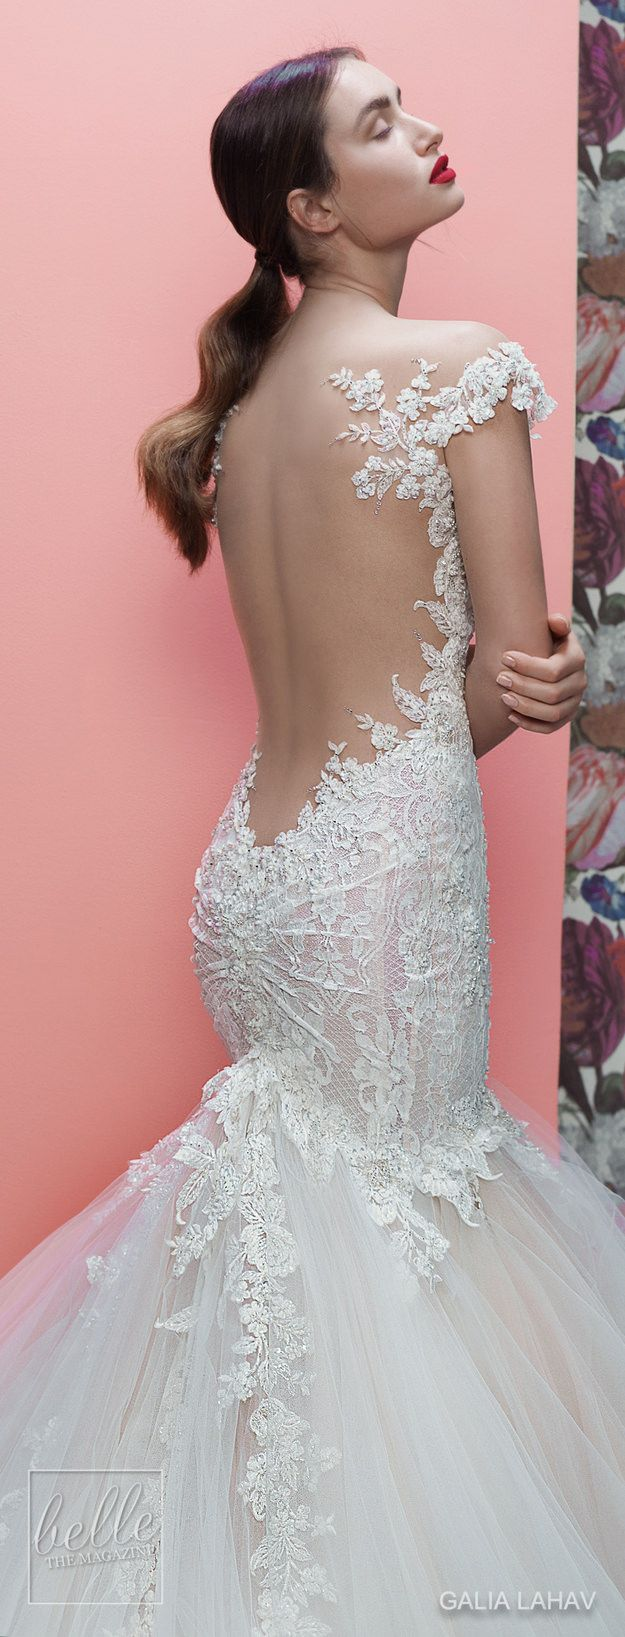 32 best Νυφικά images on Pinterest | Short wedding gowns, Wedding ...